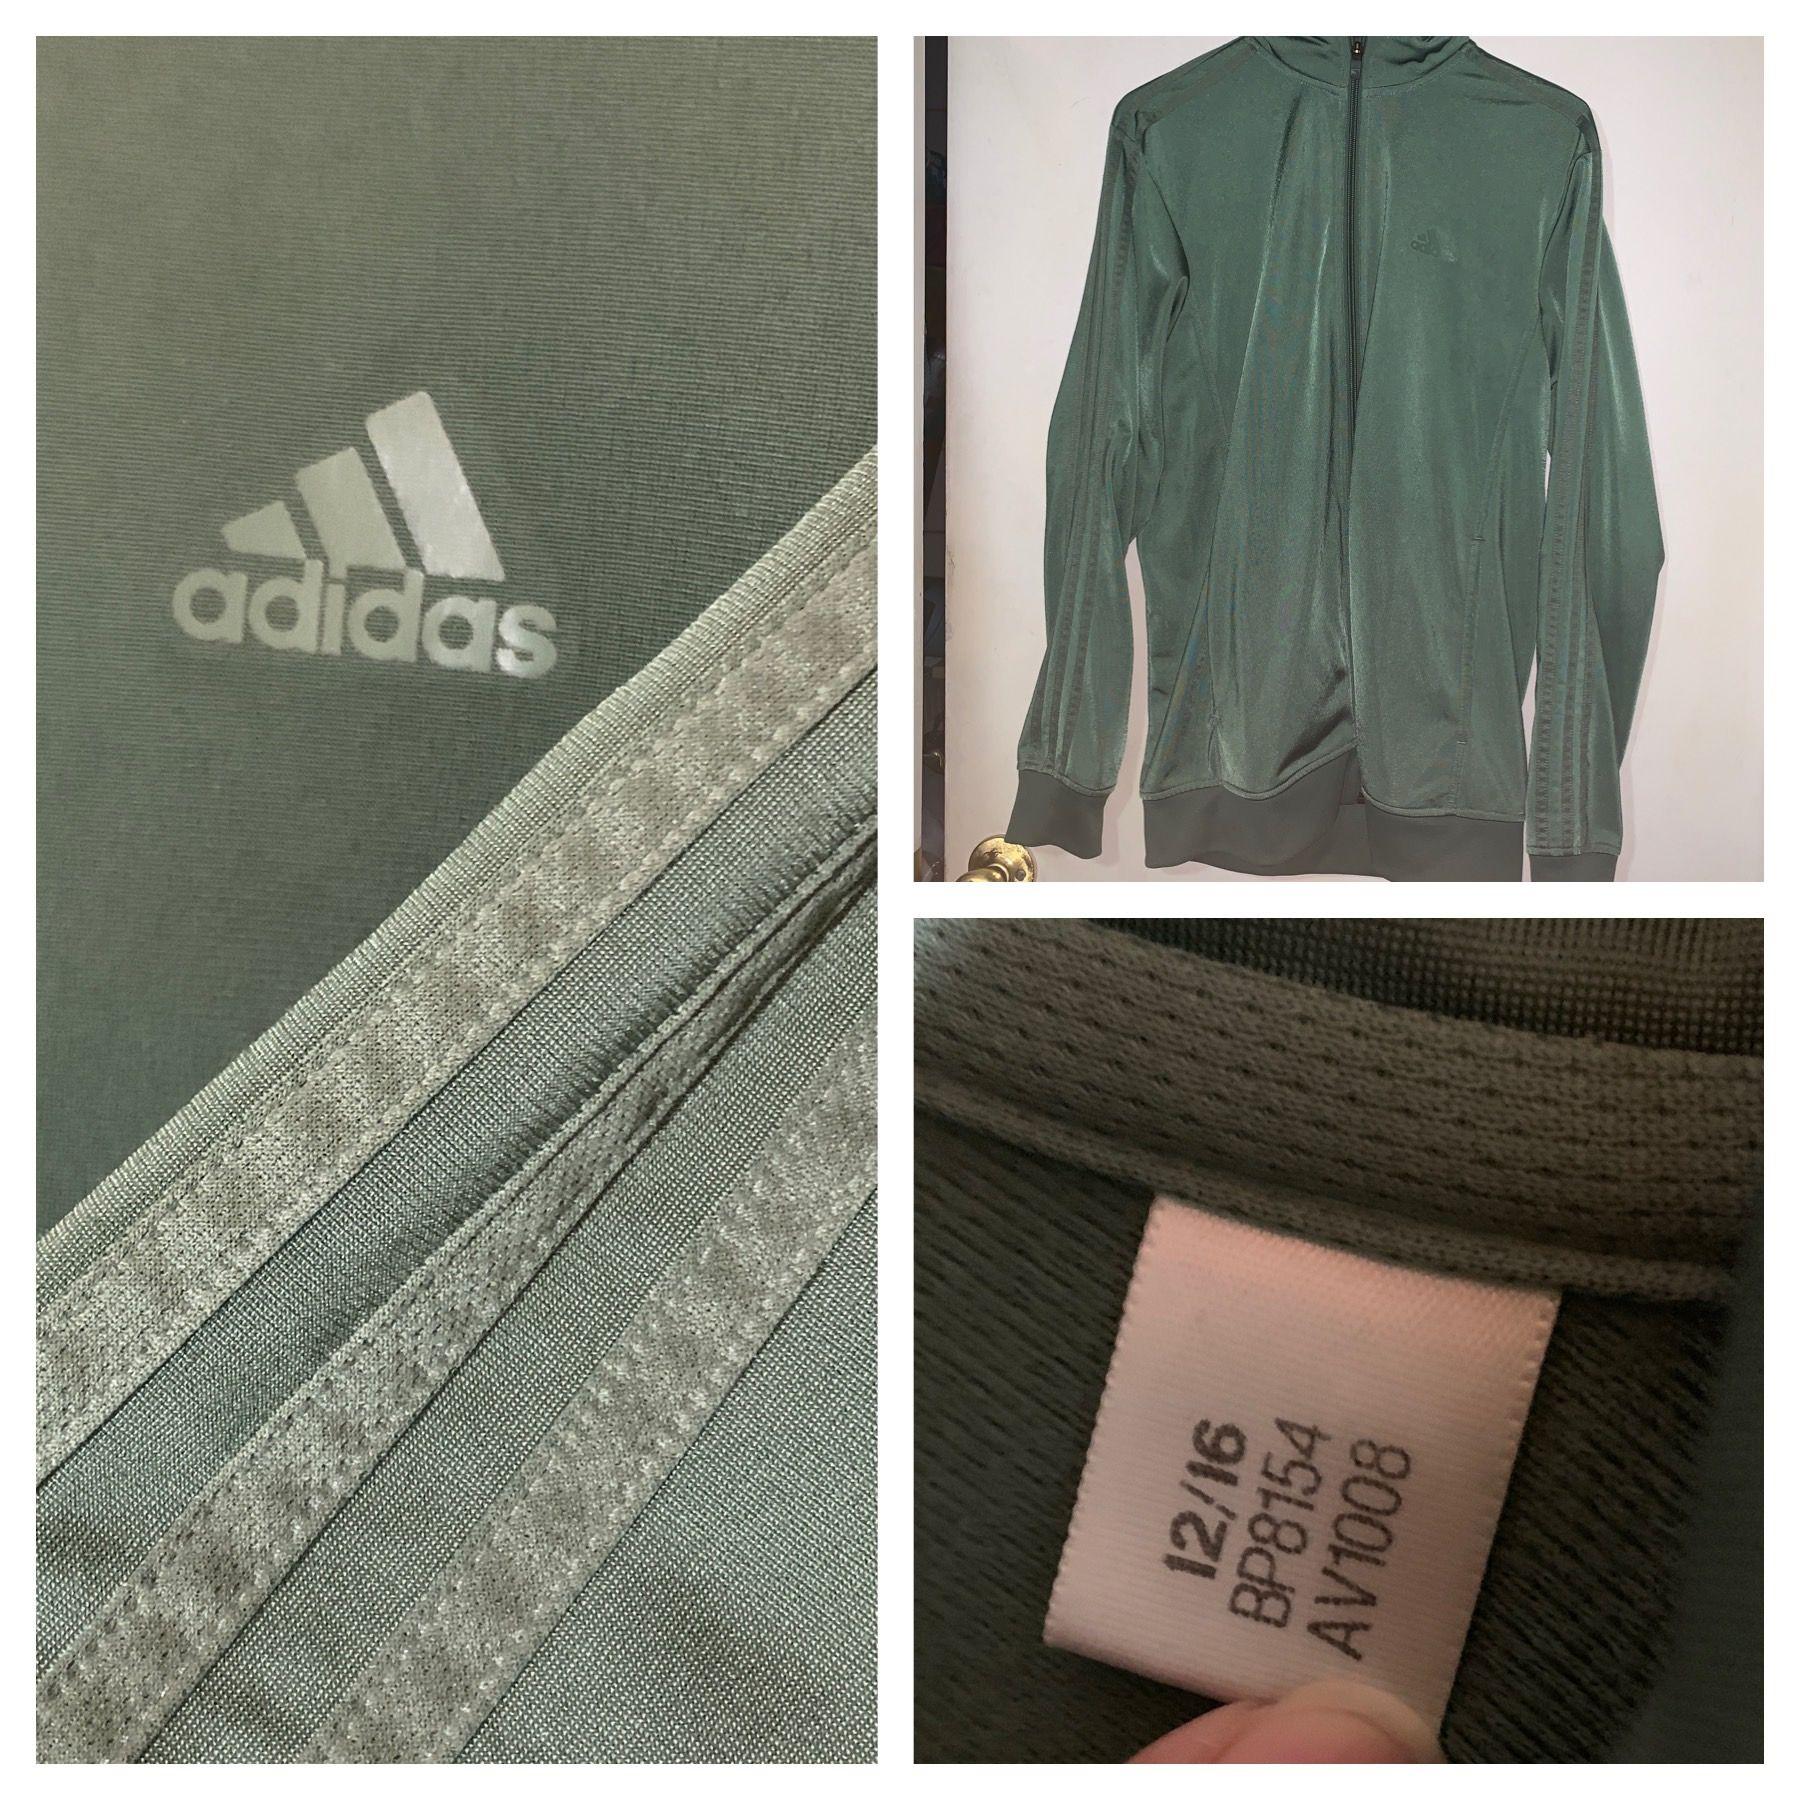 73964c179 Soft Green Adidas Track Jacket   Adidas Track Jkts I Own   Adidas ...